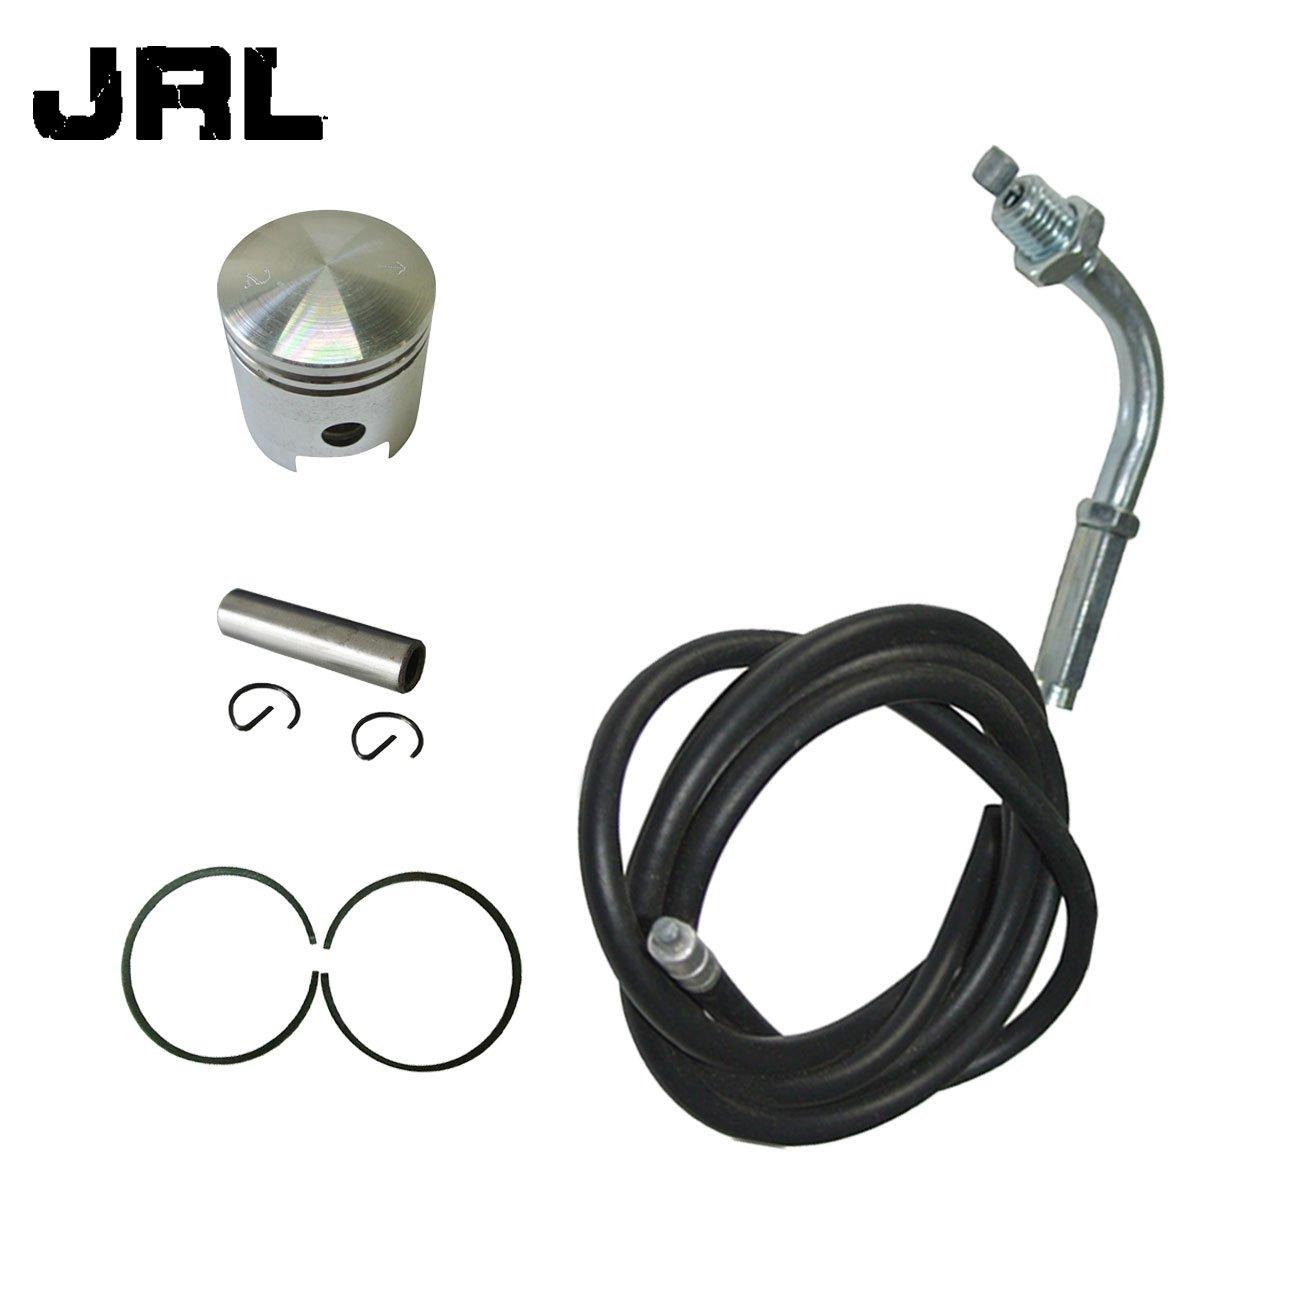 JRL Throttle Cable&Piston&2xPiston Ring&Pin For 66cc 80cc Engine Motorized Bicycle Yiwu Starlight